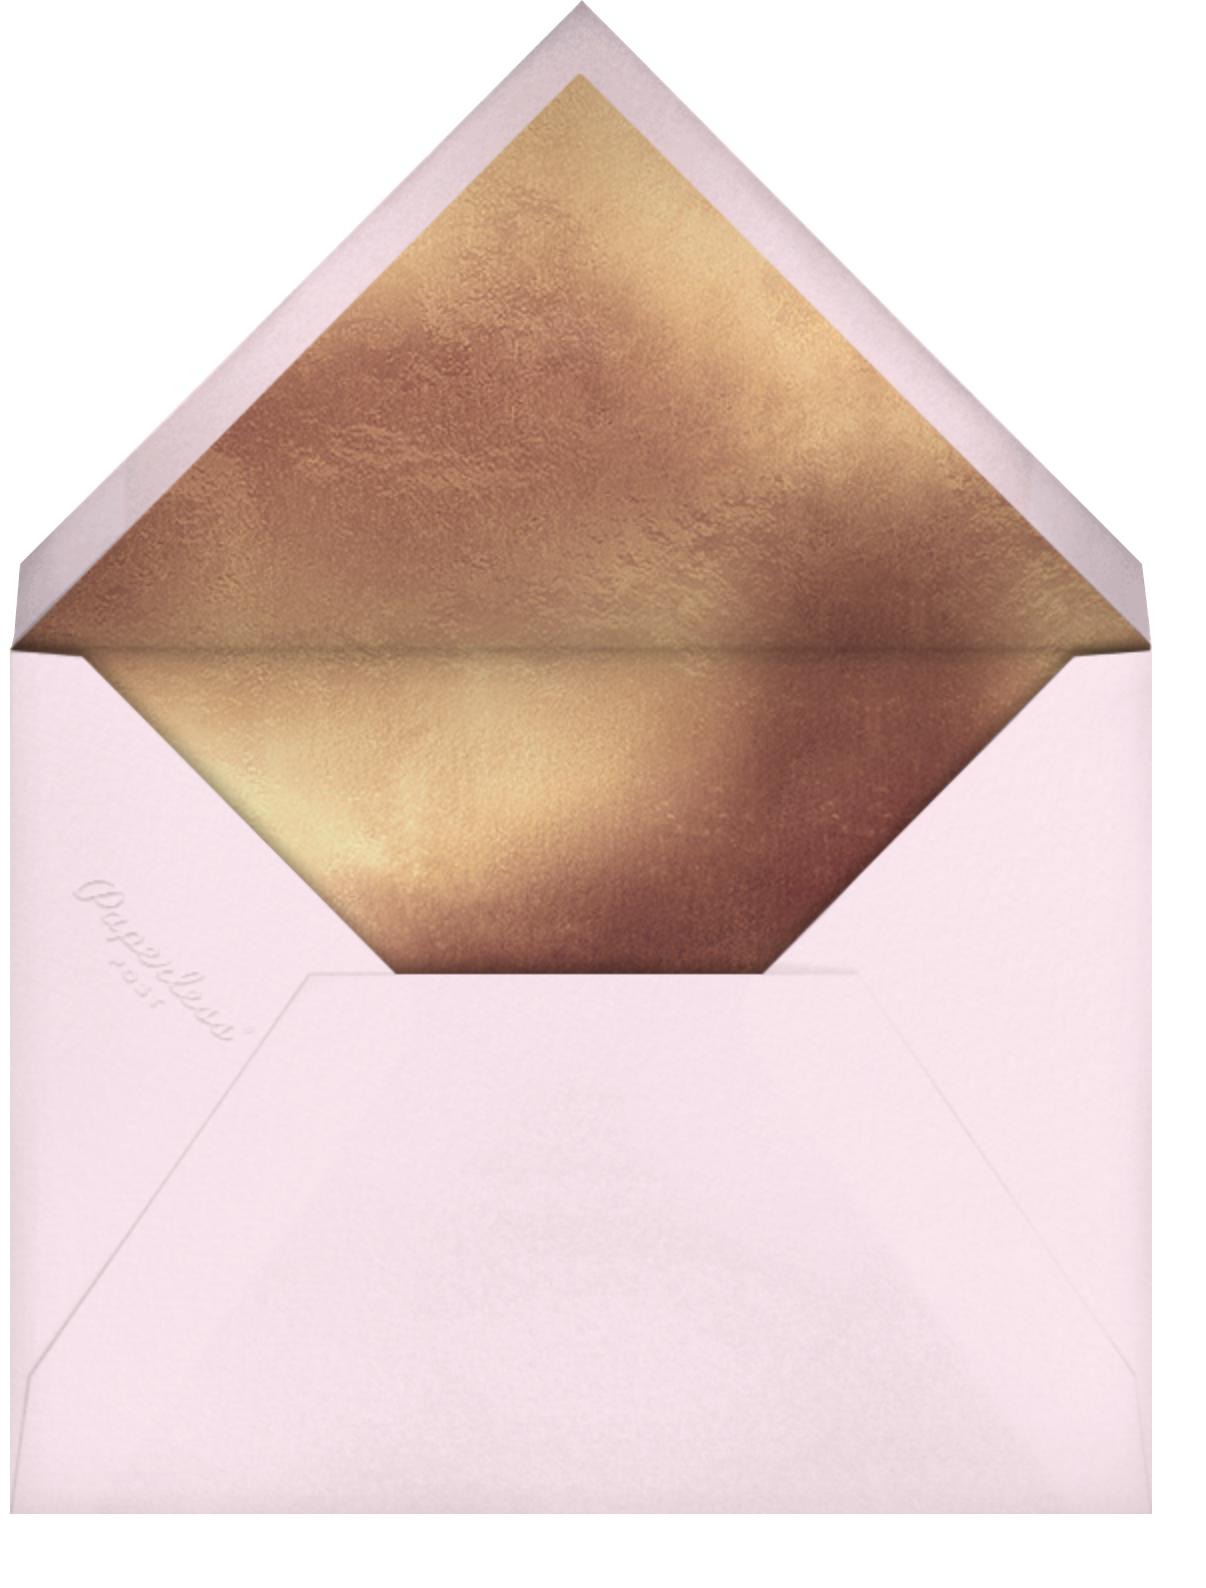 She Rules - Paperless Post - Envelope